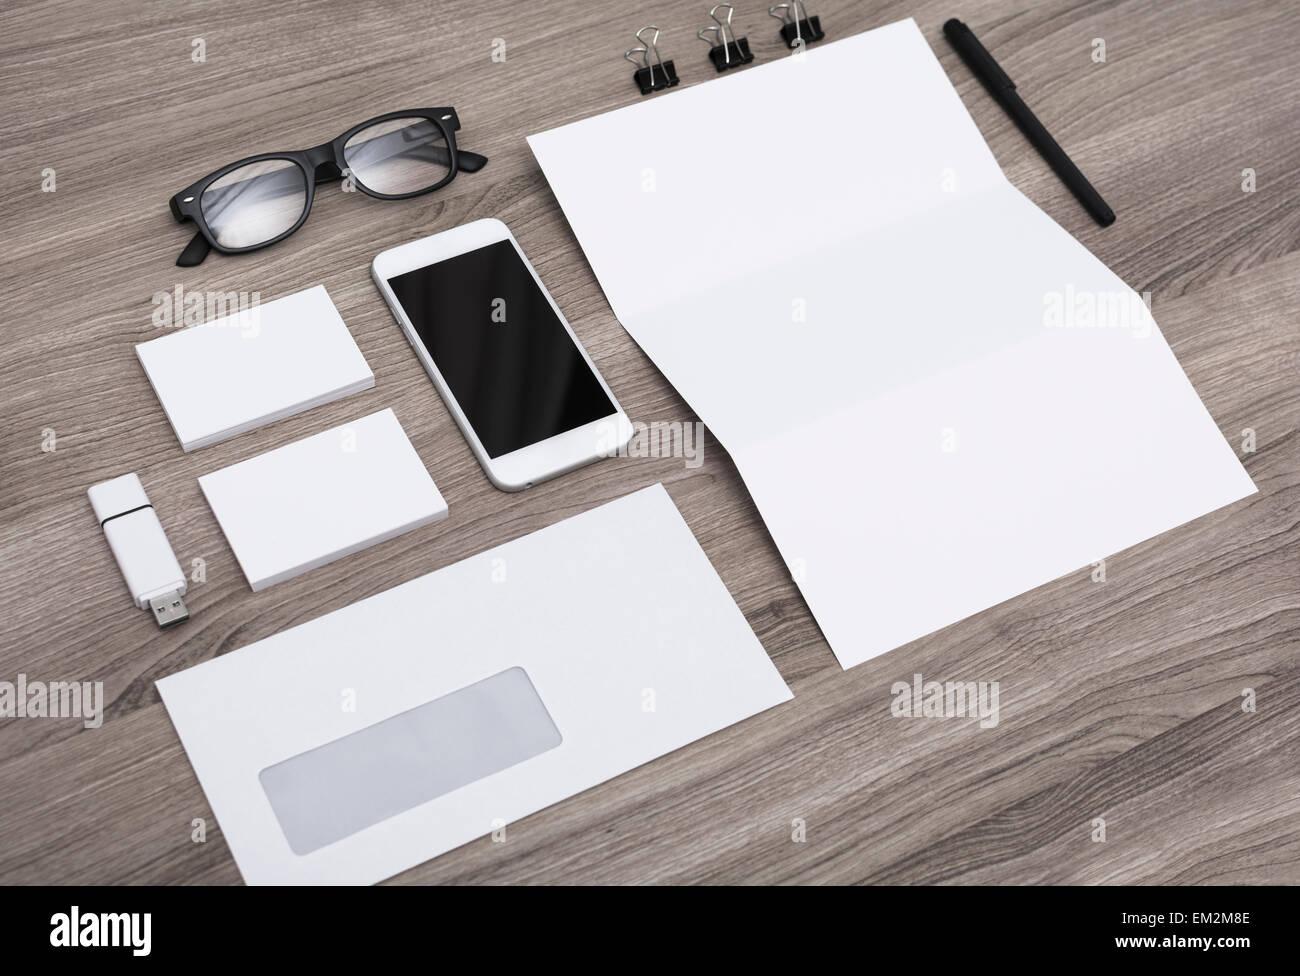 corporate identity design template. Stationary. - Stock Image